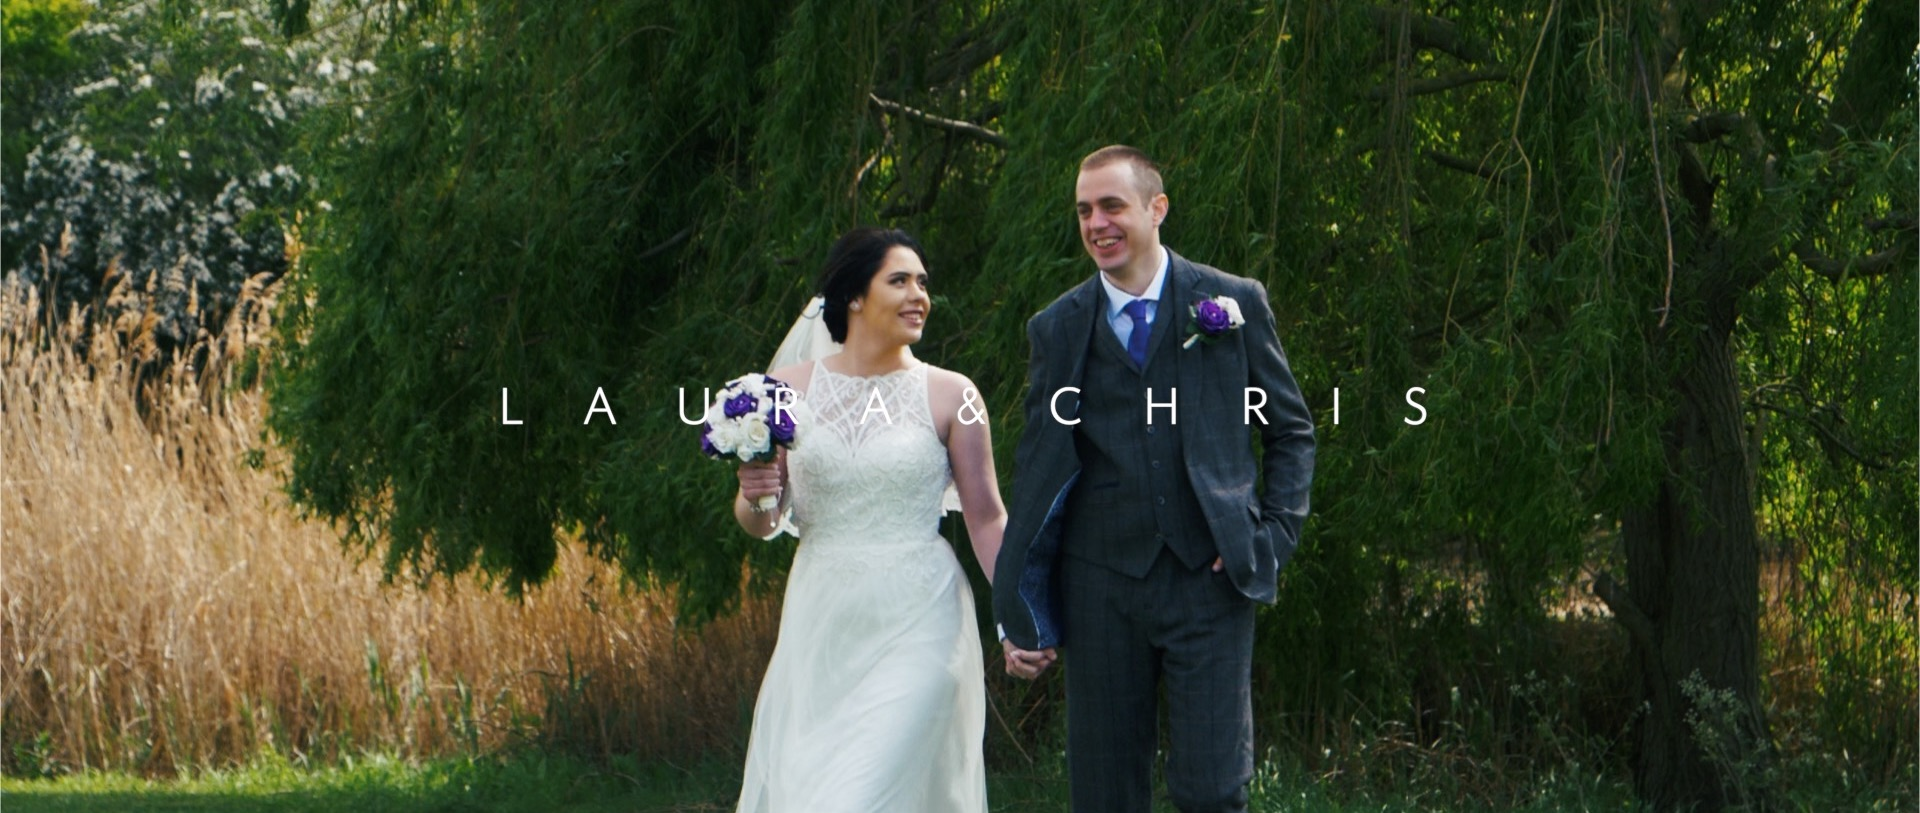 Cromwell Manor Wedding Videographer 3 Cheers Media.jpg